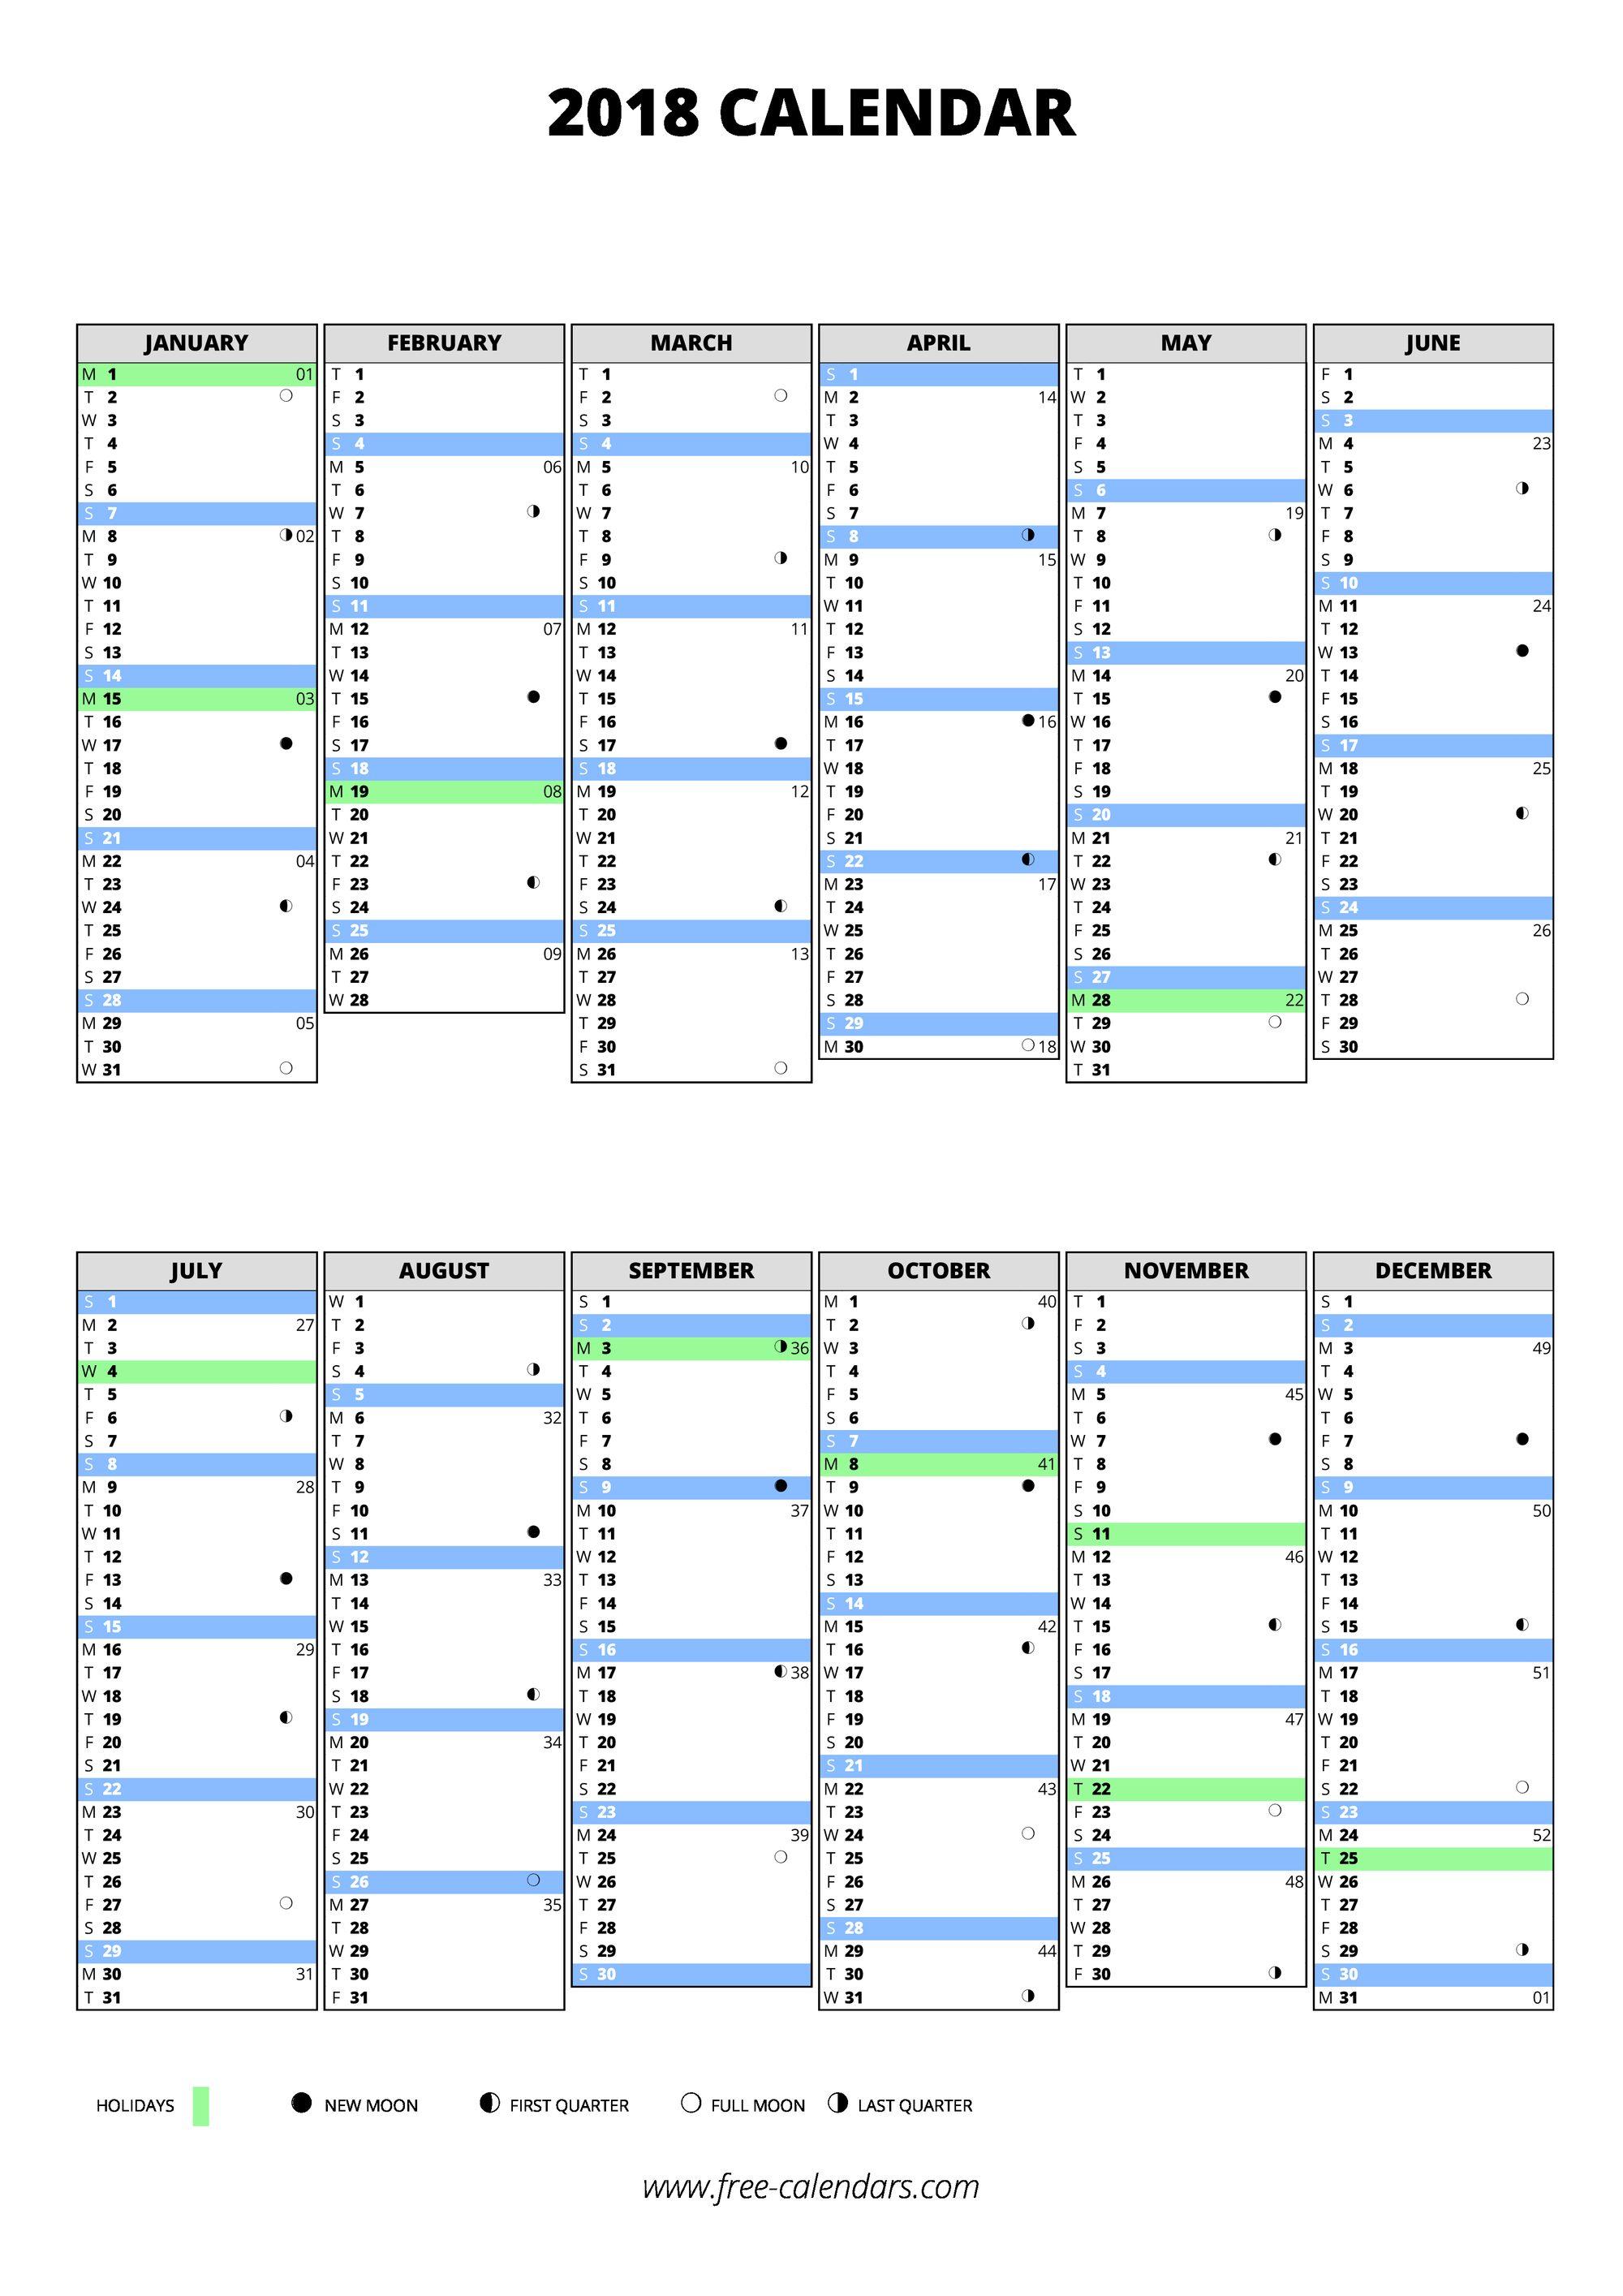 2018 Calendar Free Calendars